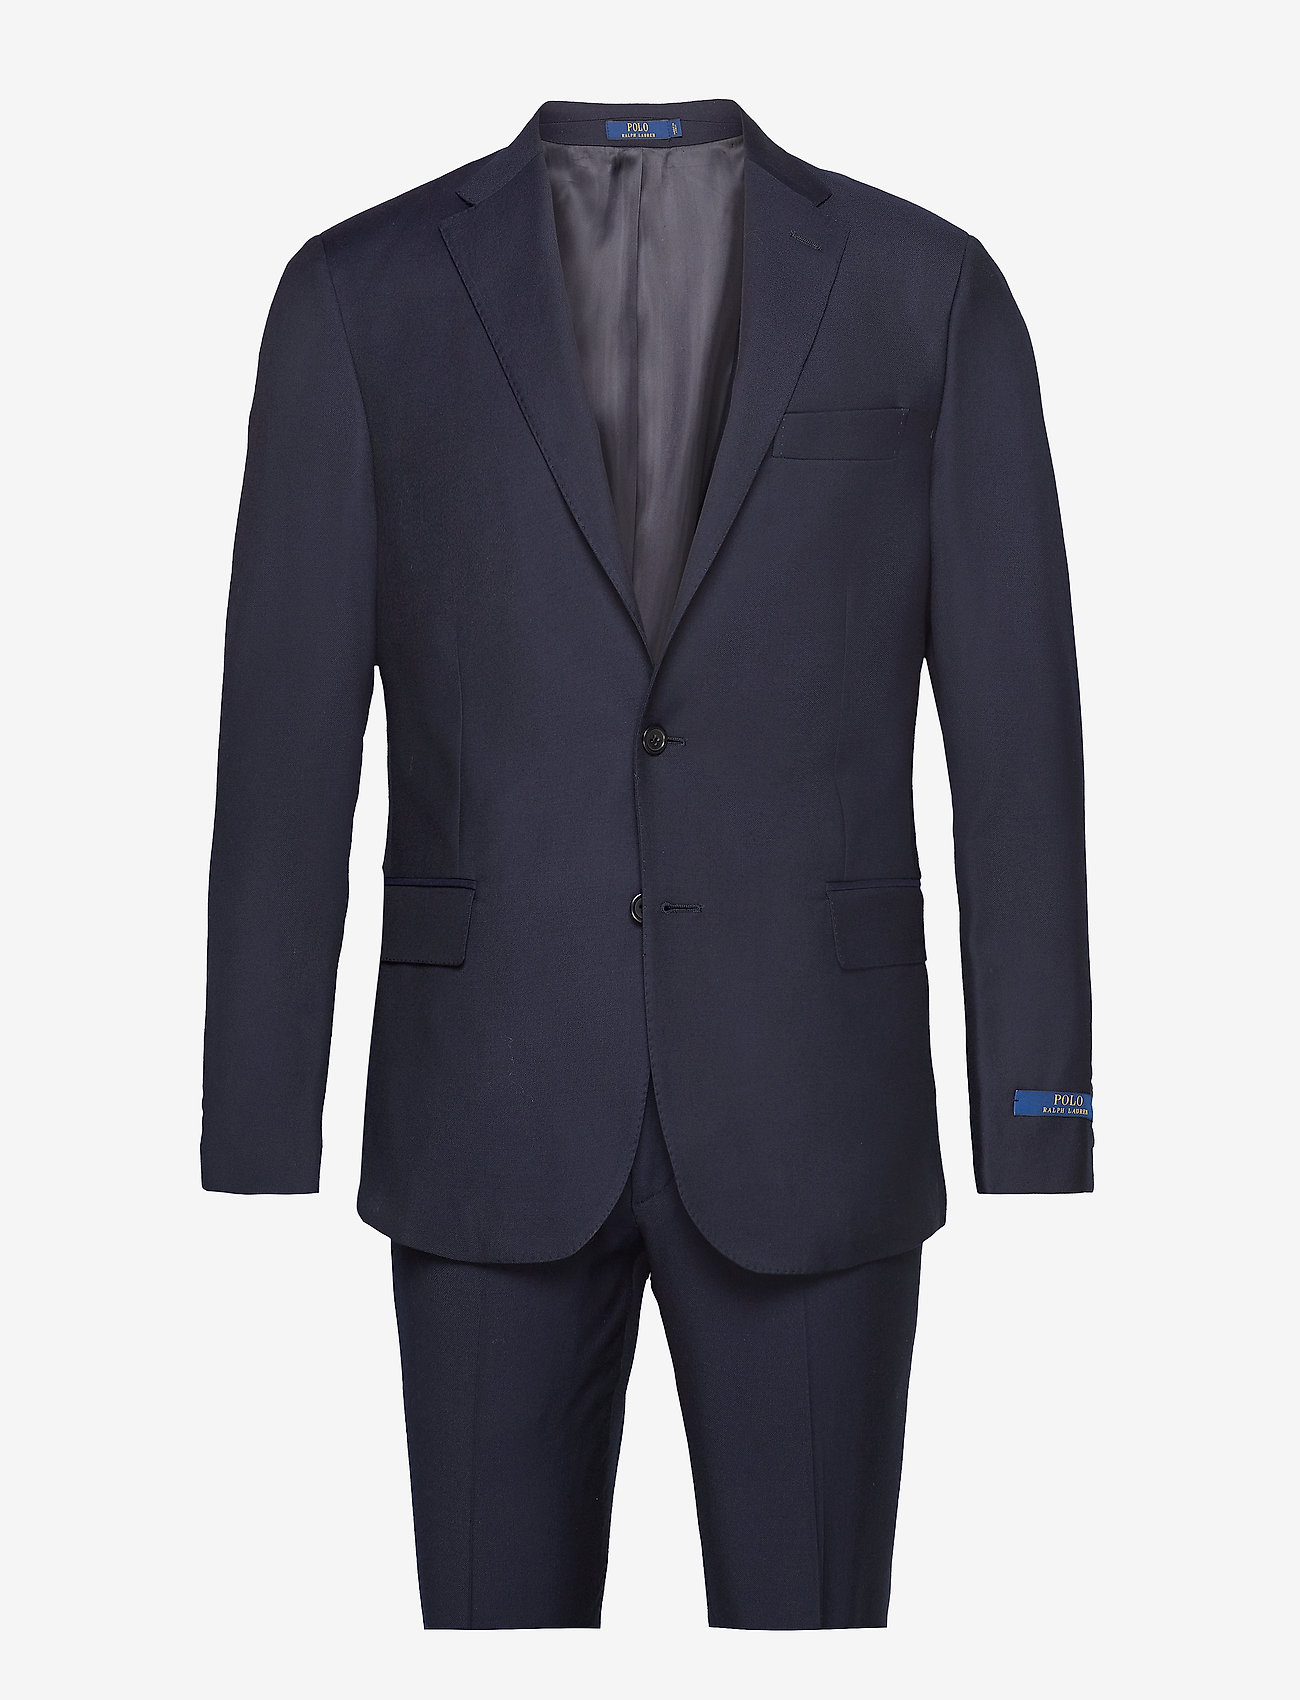 Polo Ralph Lauren - Polo Wool Twill Suit - Žaketes ar vienas pogas aizdari - classic navy - 1